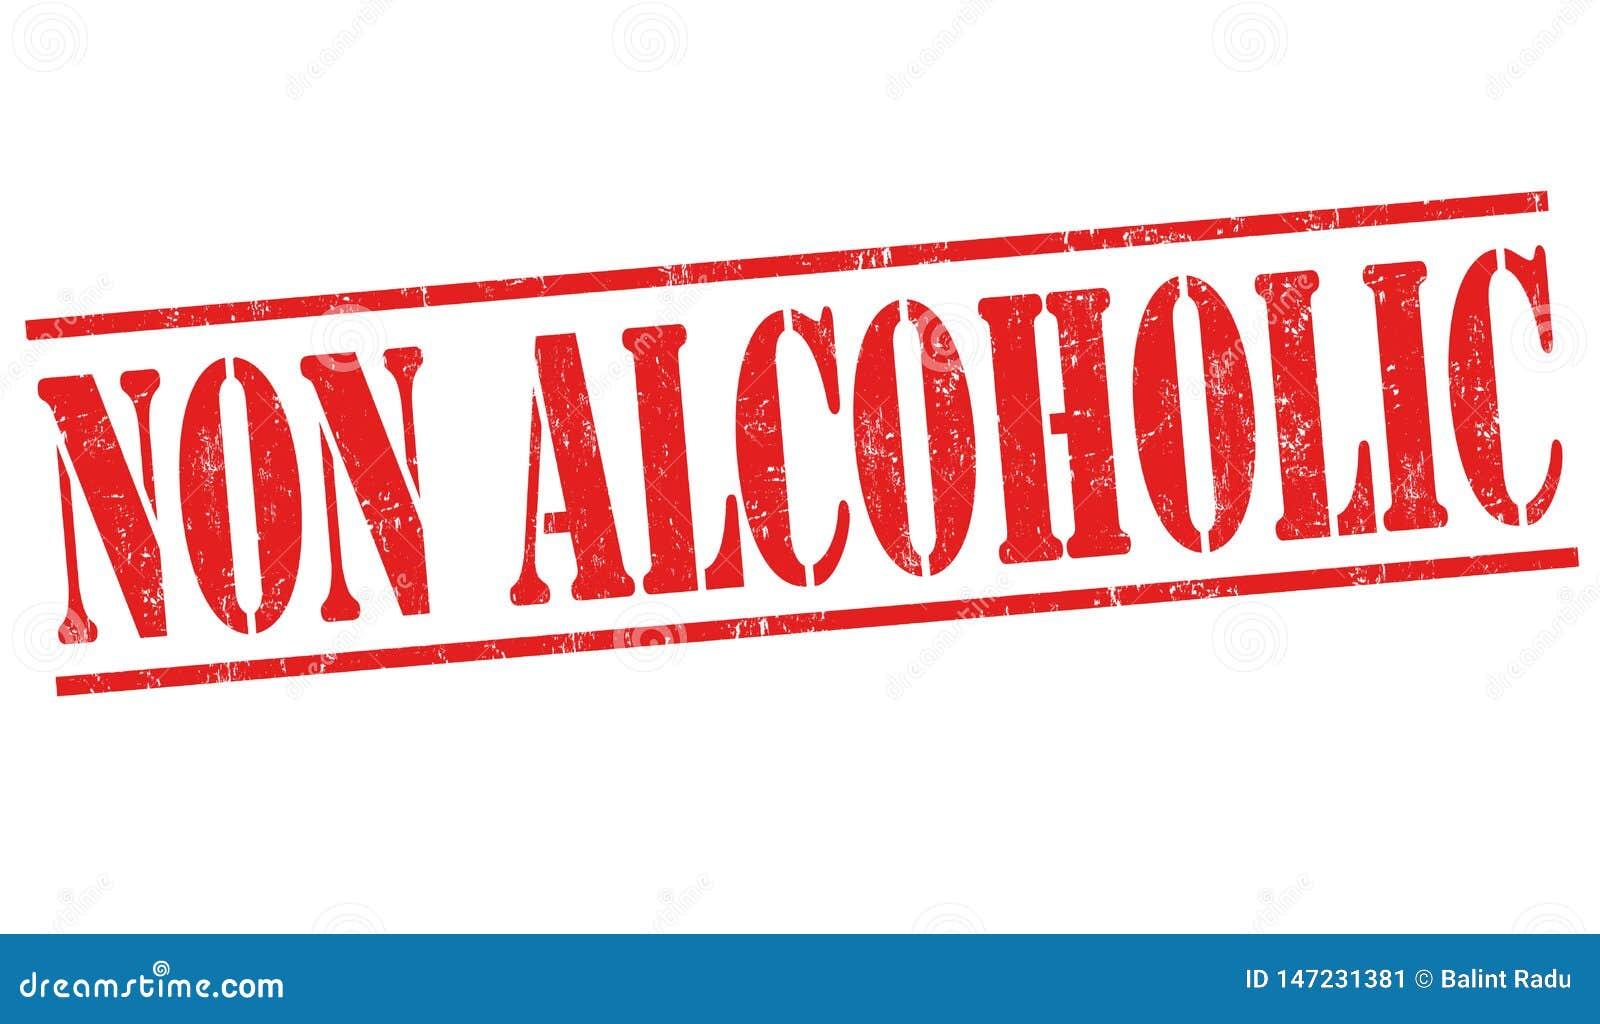 Non alkoholiczny znak lub znaczek